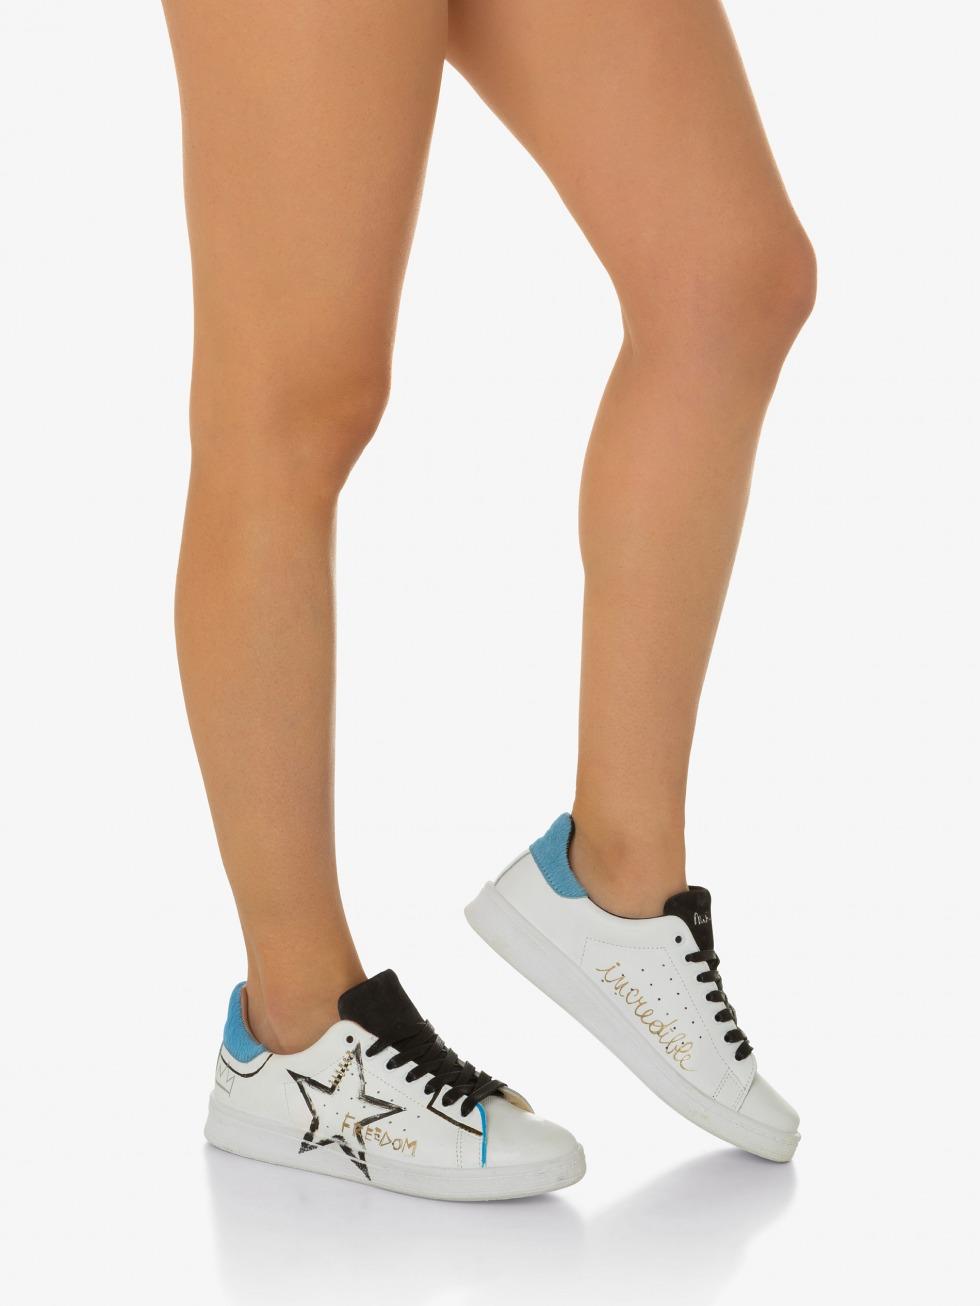 Daiquiri Sneakers - Star Sky Writer